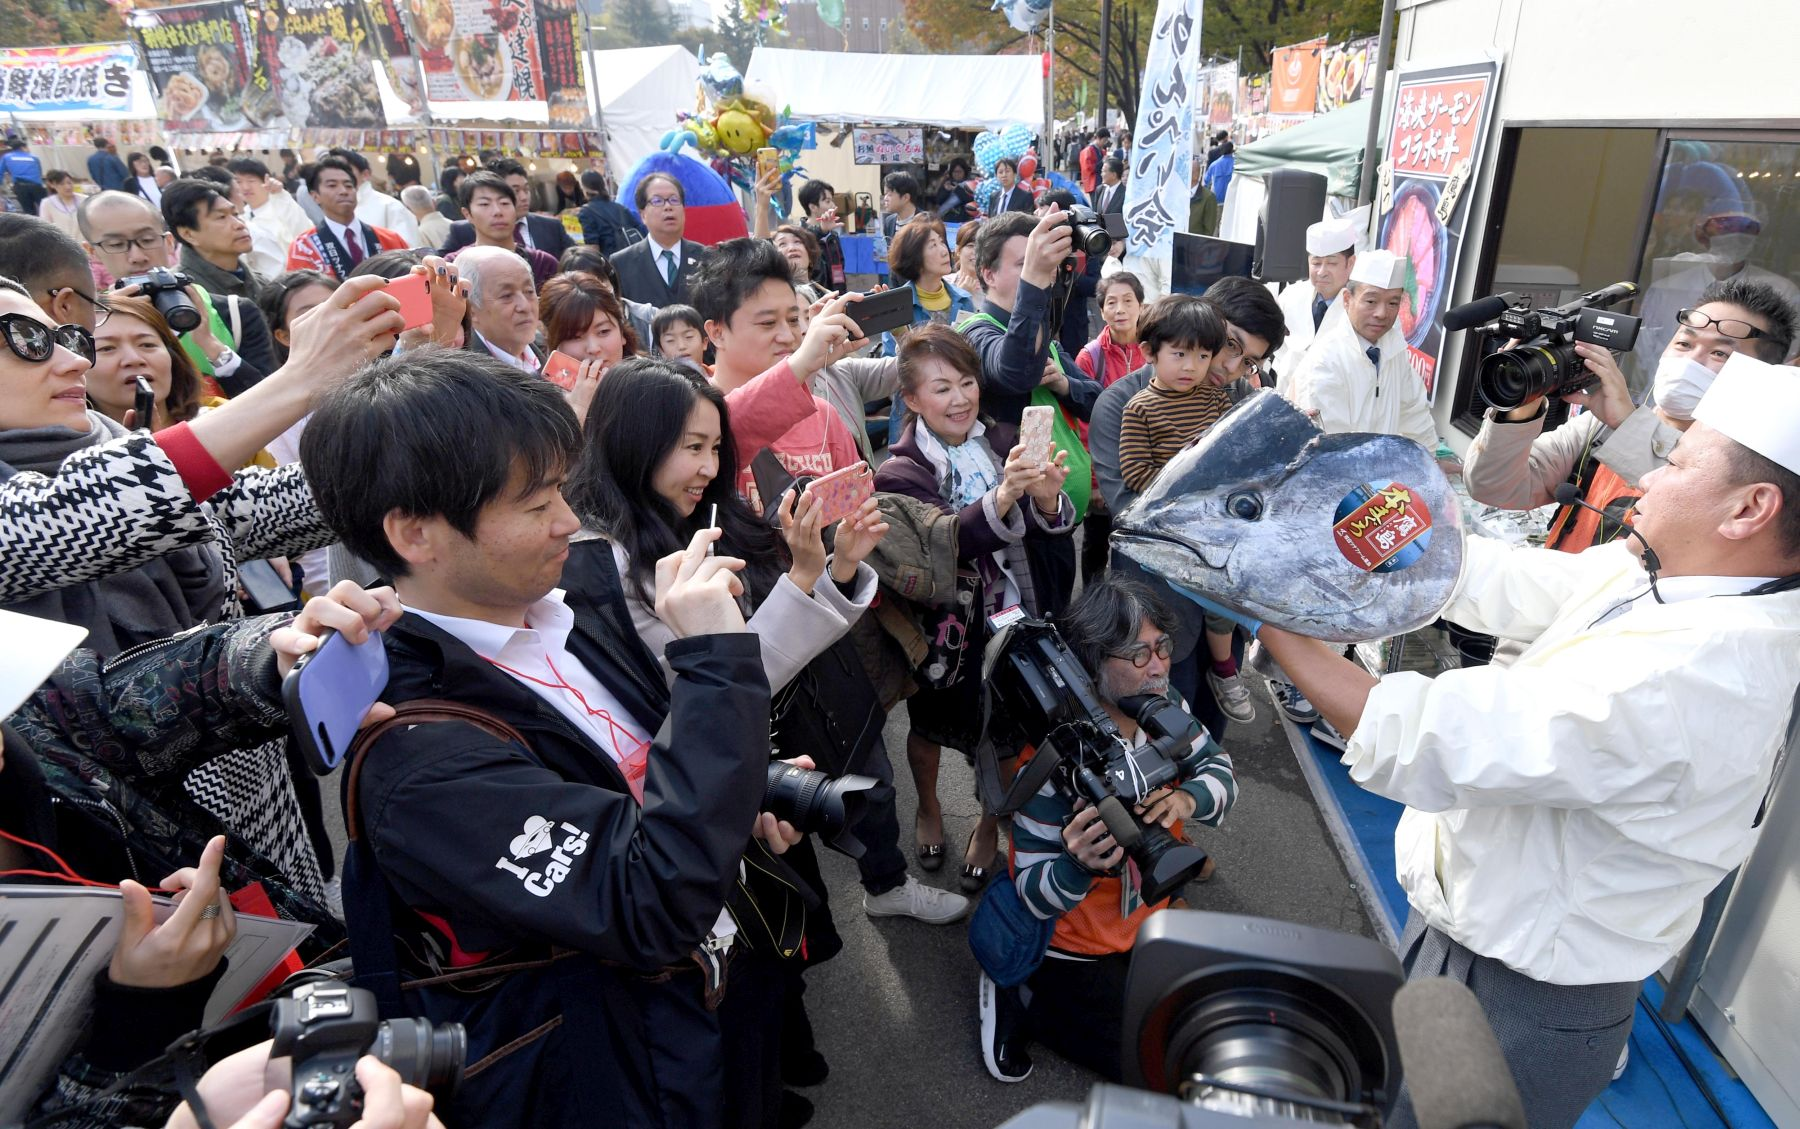 Japan Fisherman's Festival 2019